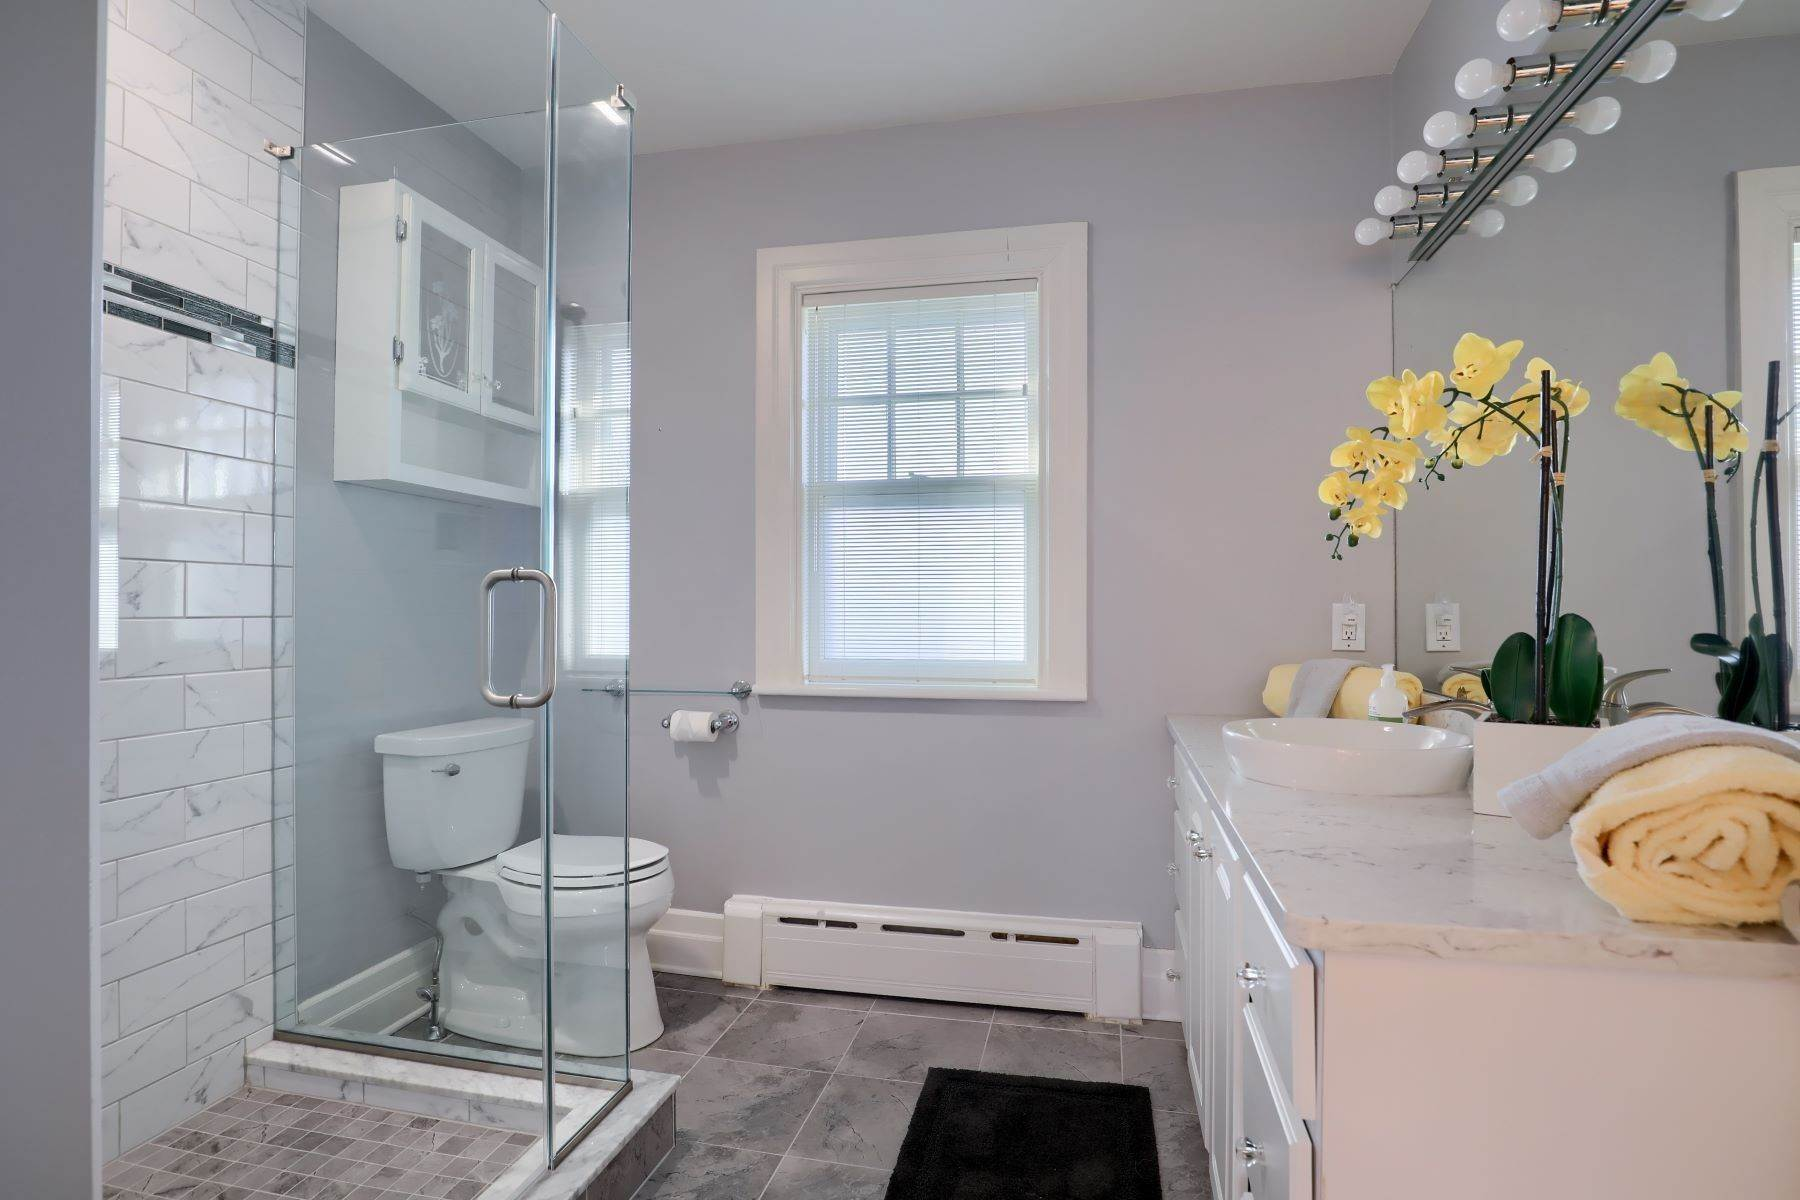 29. Single Family Homes for Sale at 206 E Granada Ave Hershey, Pennsylvania 17033 United States